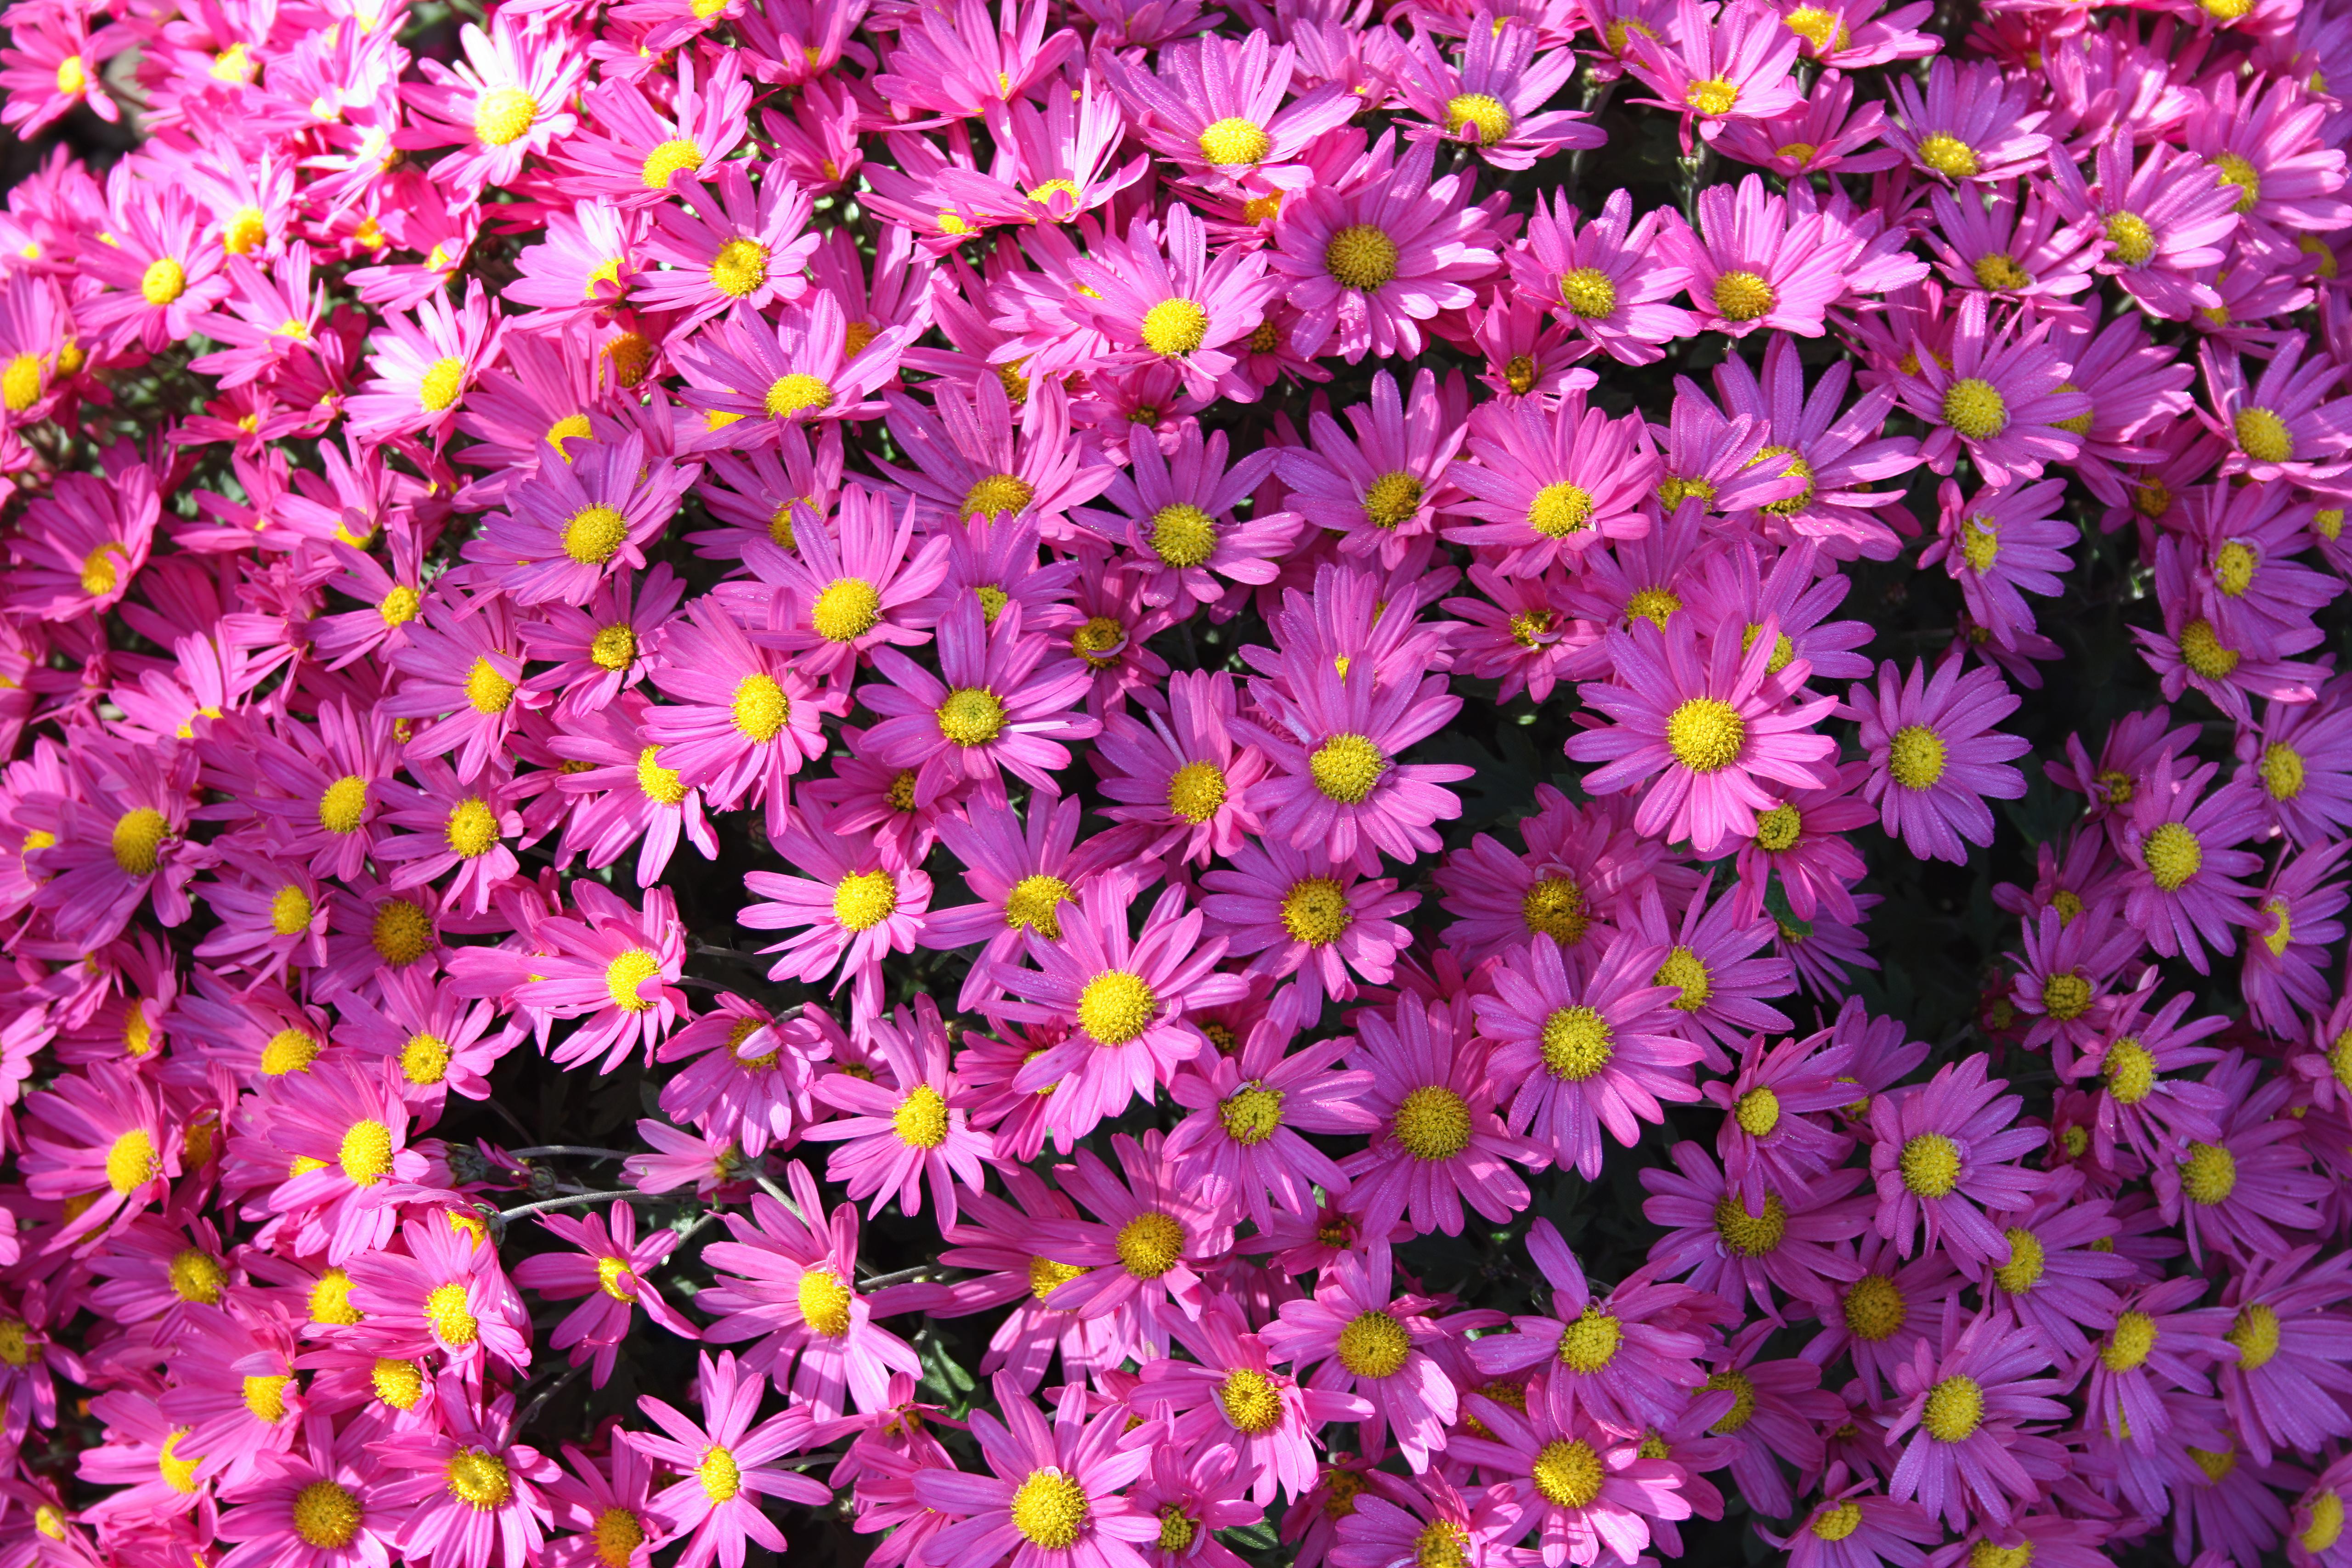 violet flowers 4k 1630616437 - Violet Flowers 4k - Violet Flowers wallpapers, Violet Flowers 4k wallpapeers